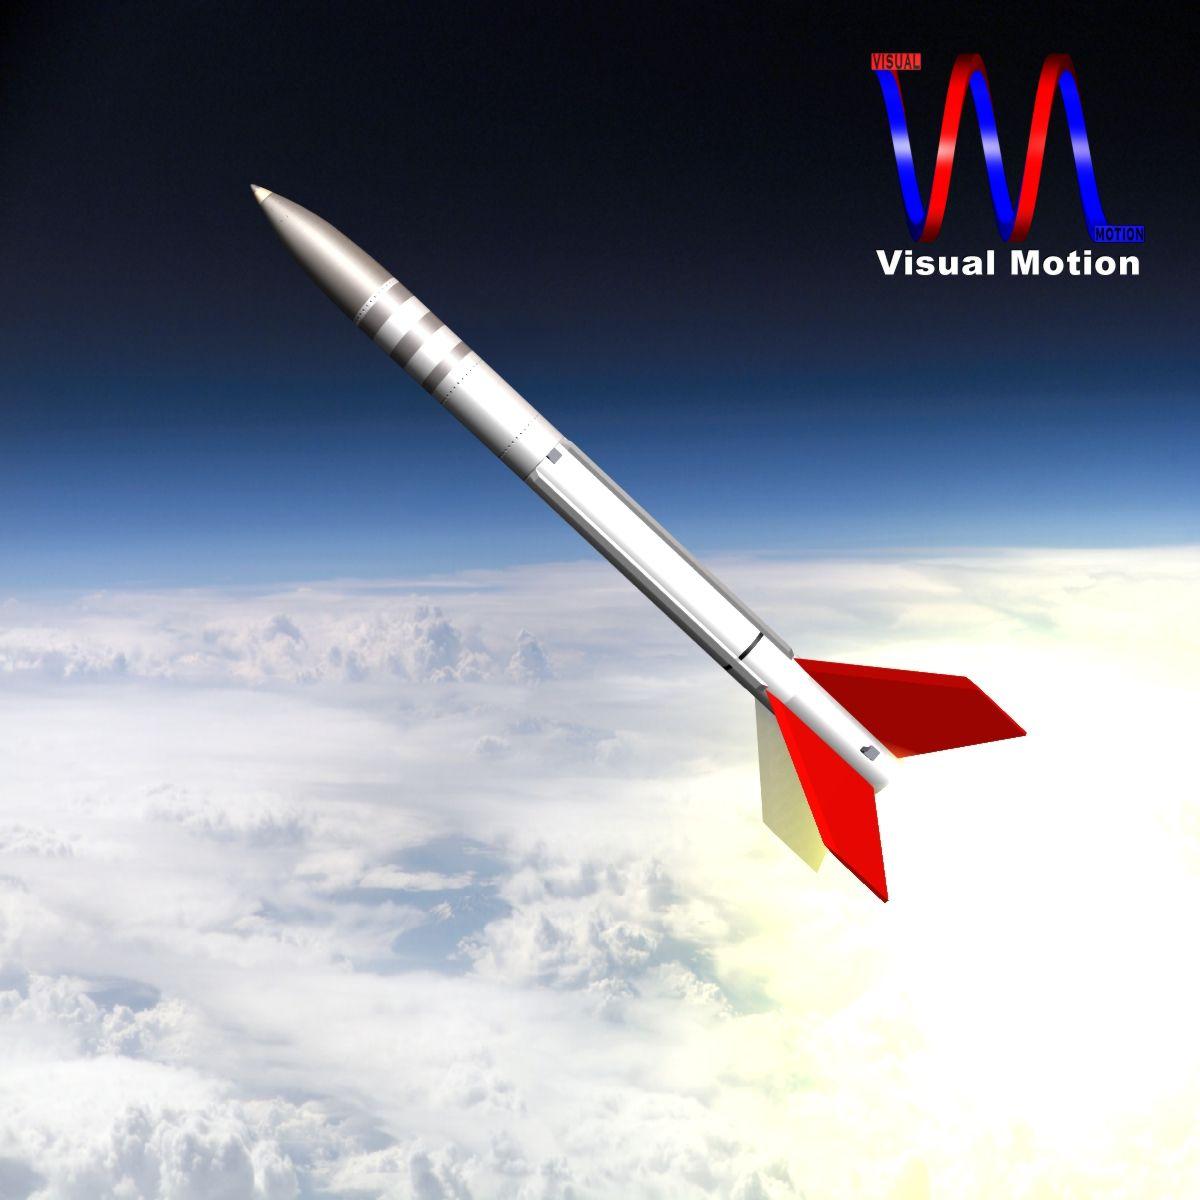 us terrier-lynx rocket 3d model 3ds dxf cob x obj 140323